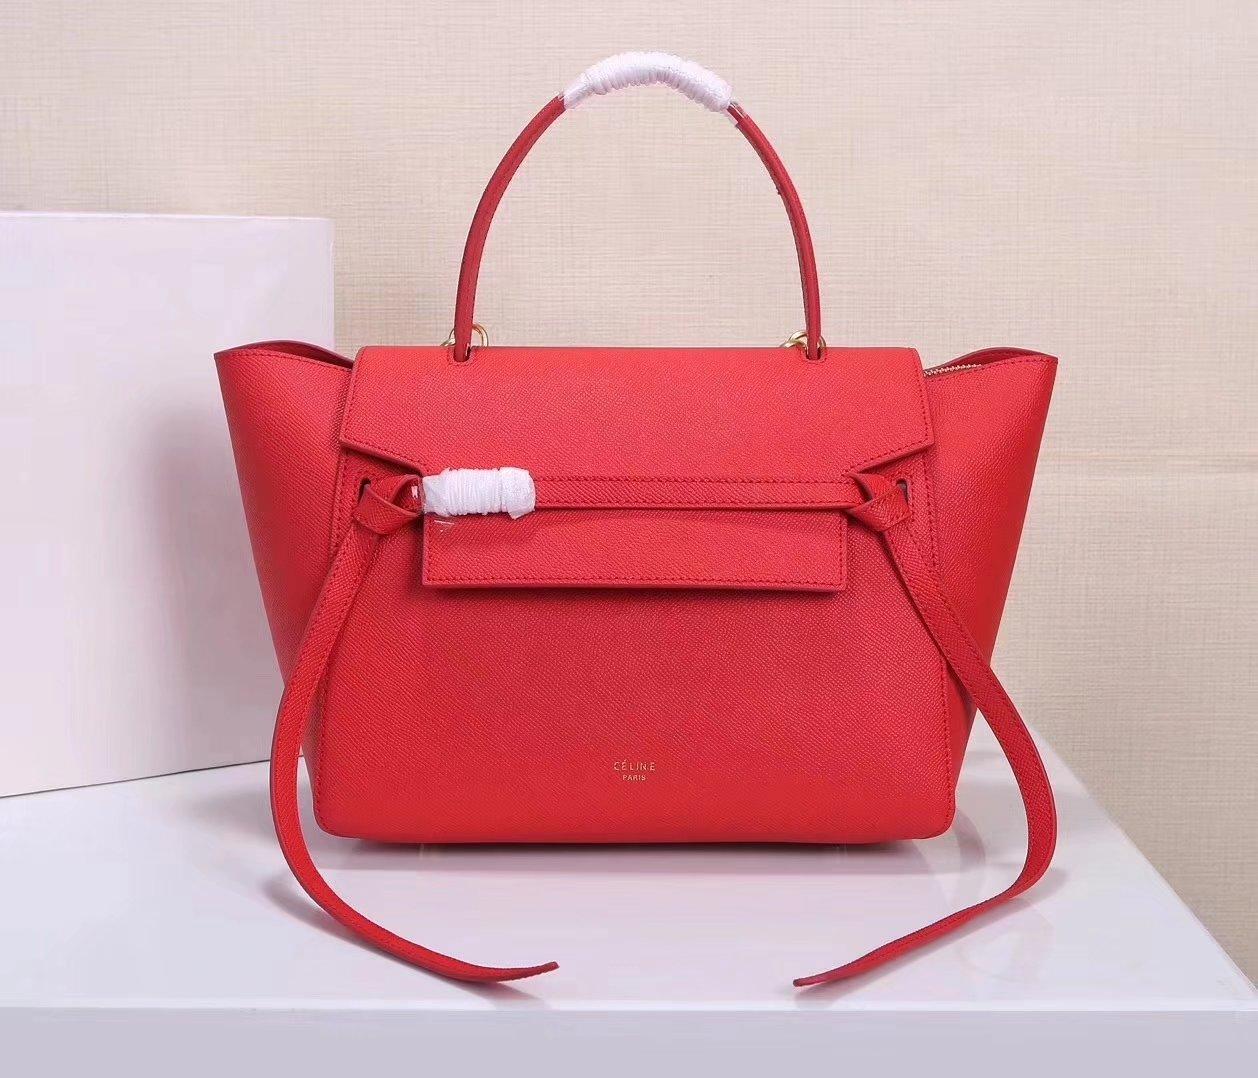 Celine Women Mini Belt Bag in Grained Calfskin Leather Red